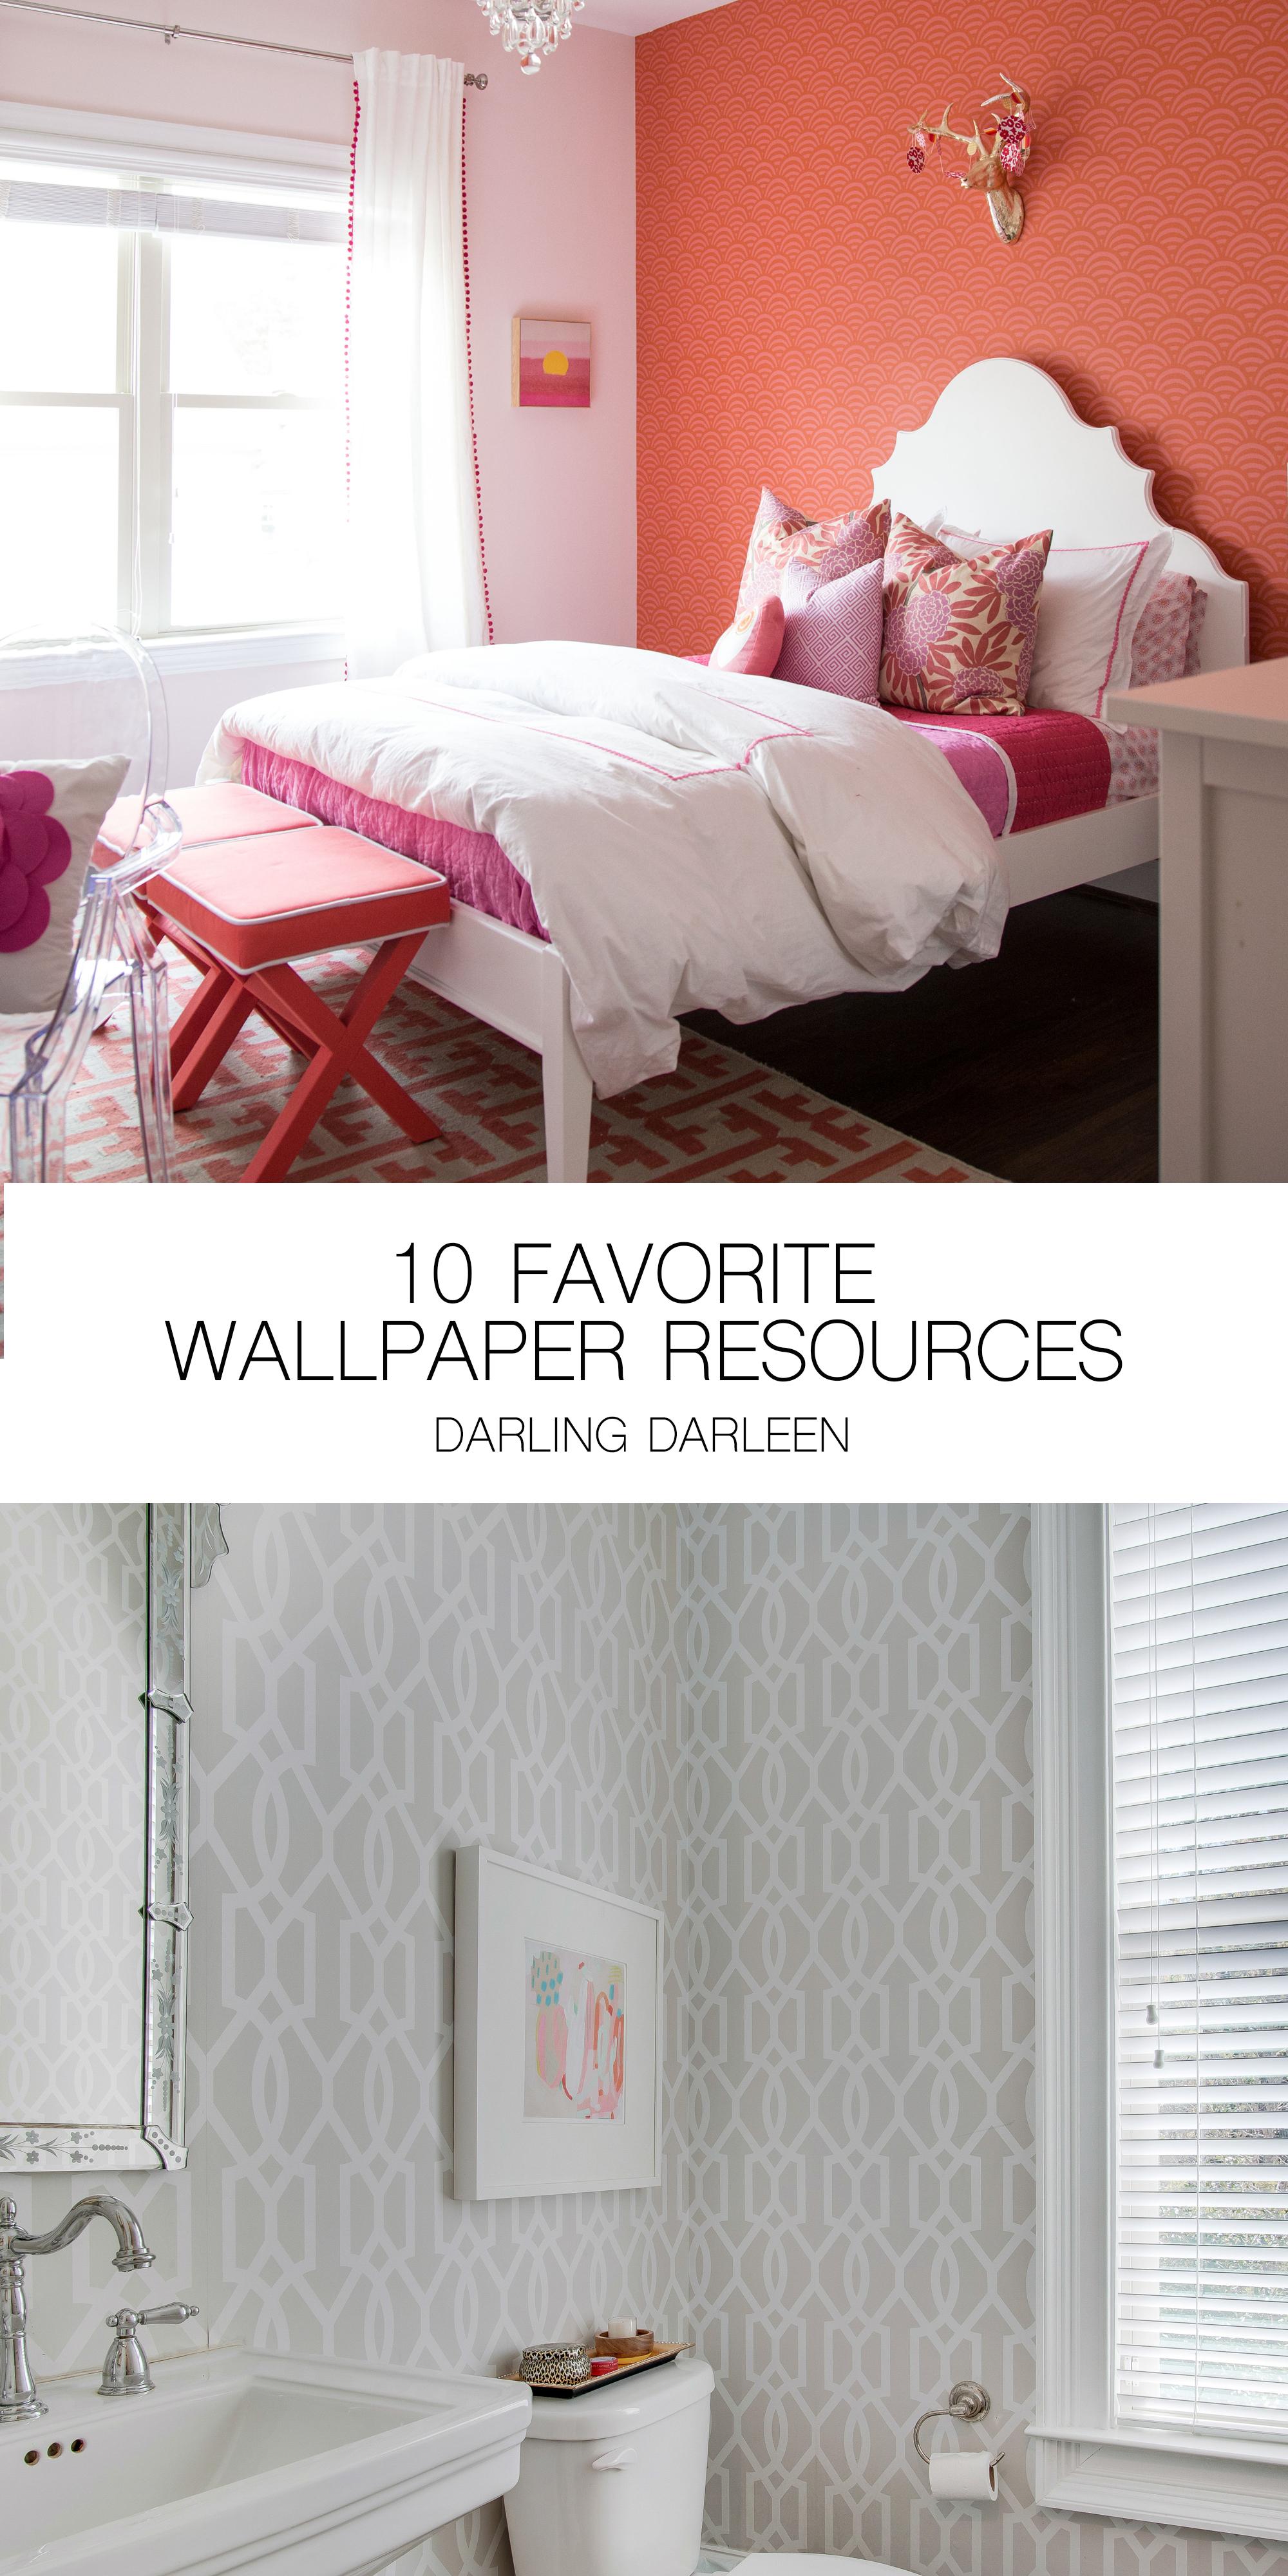 10 Favorite Wallpaper Resources for online shopping || Darling Darleen